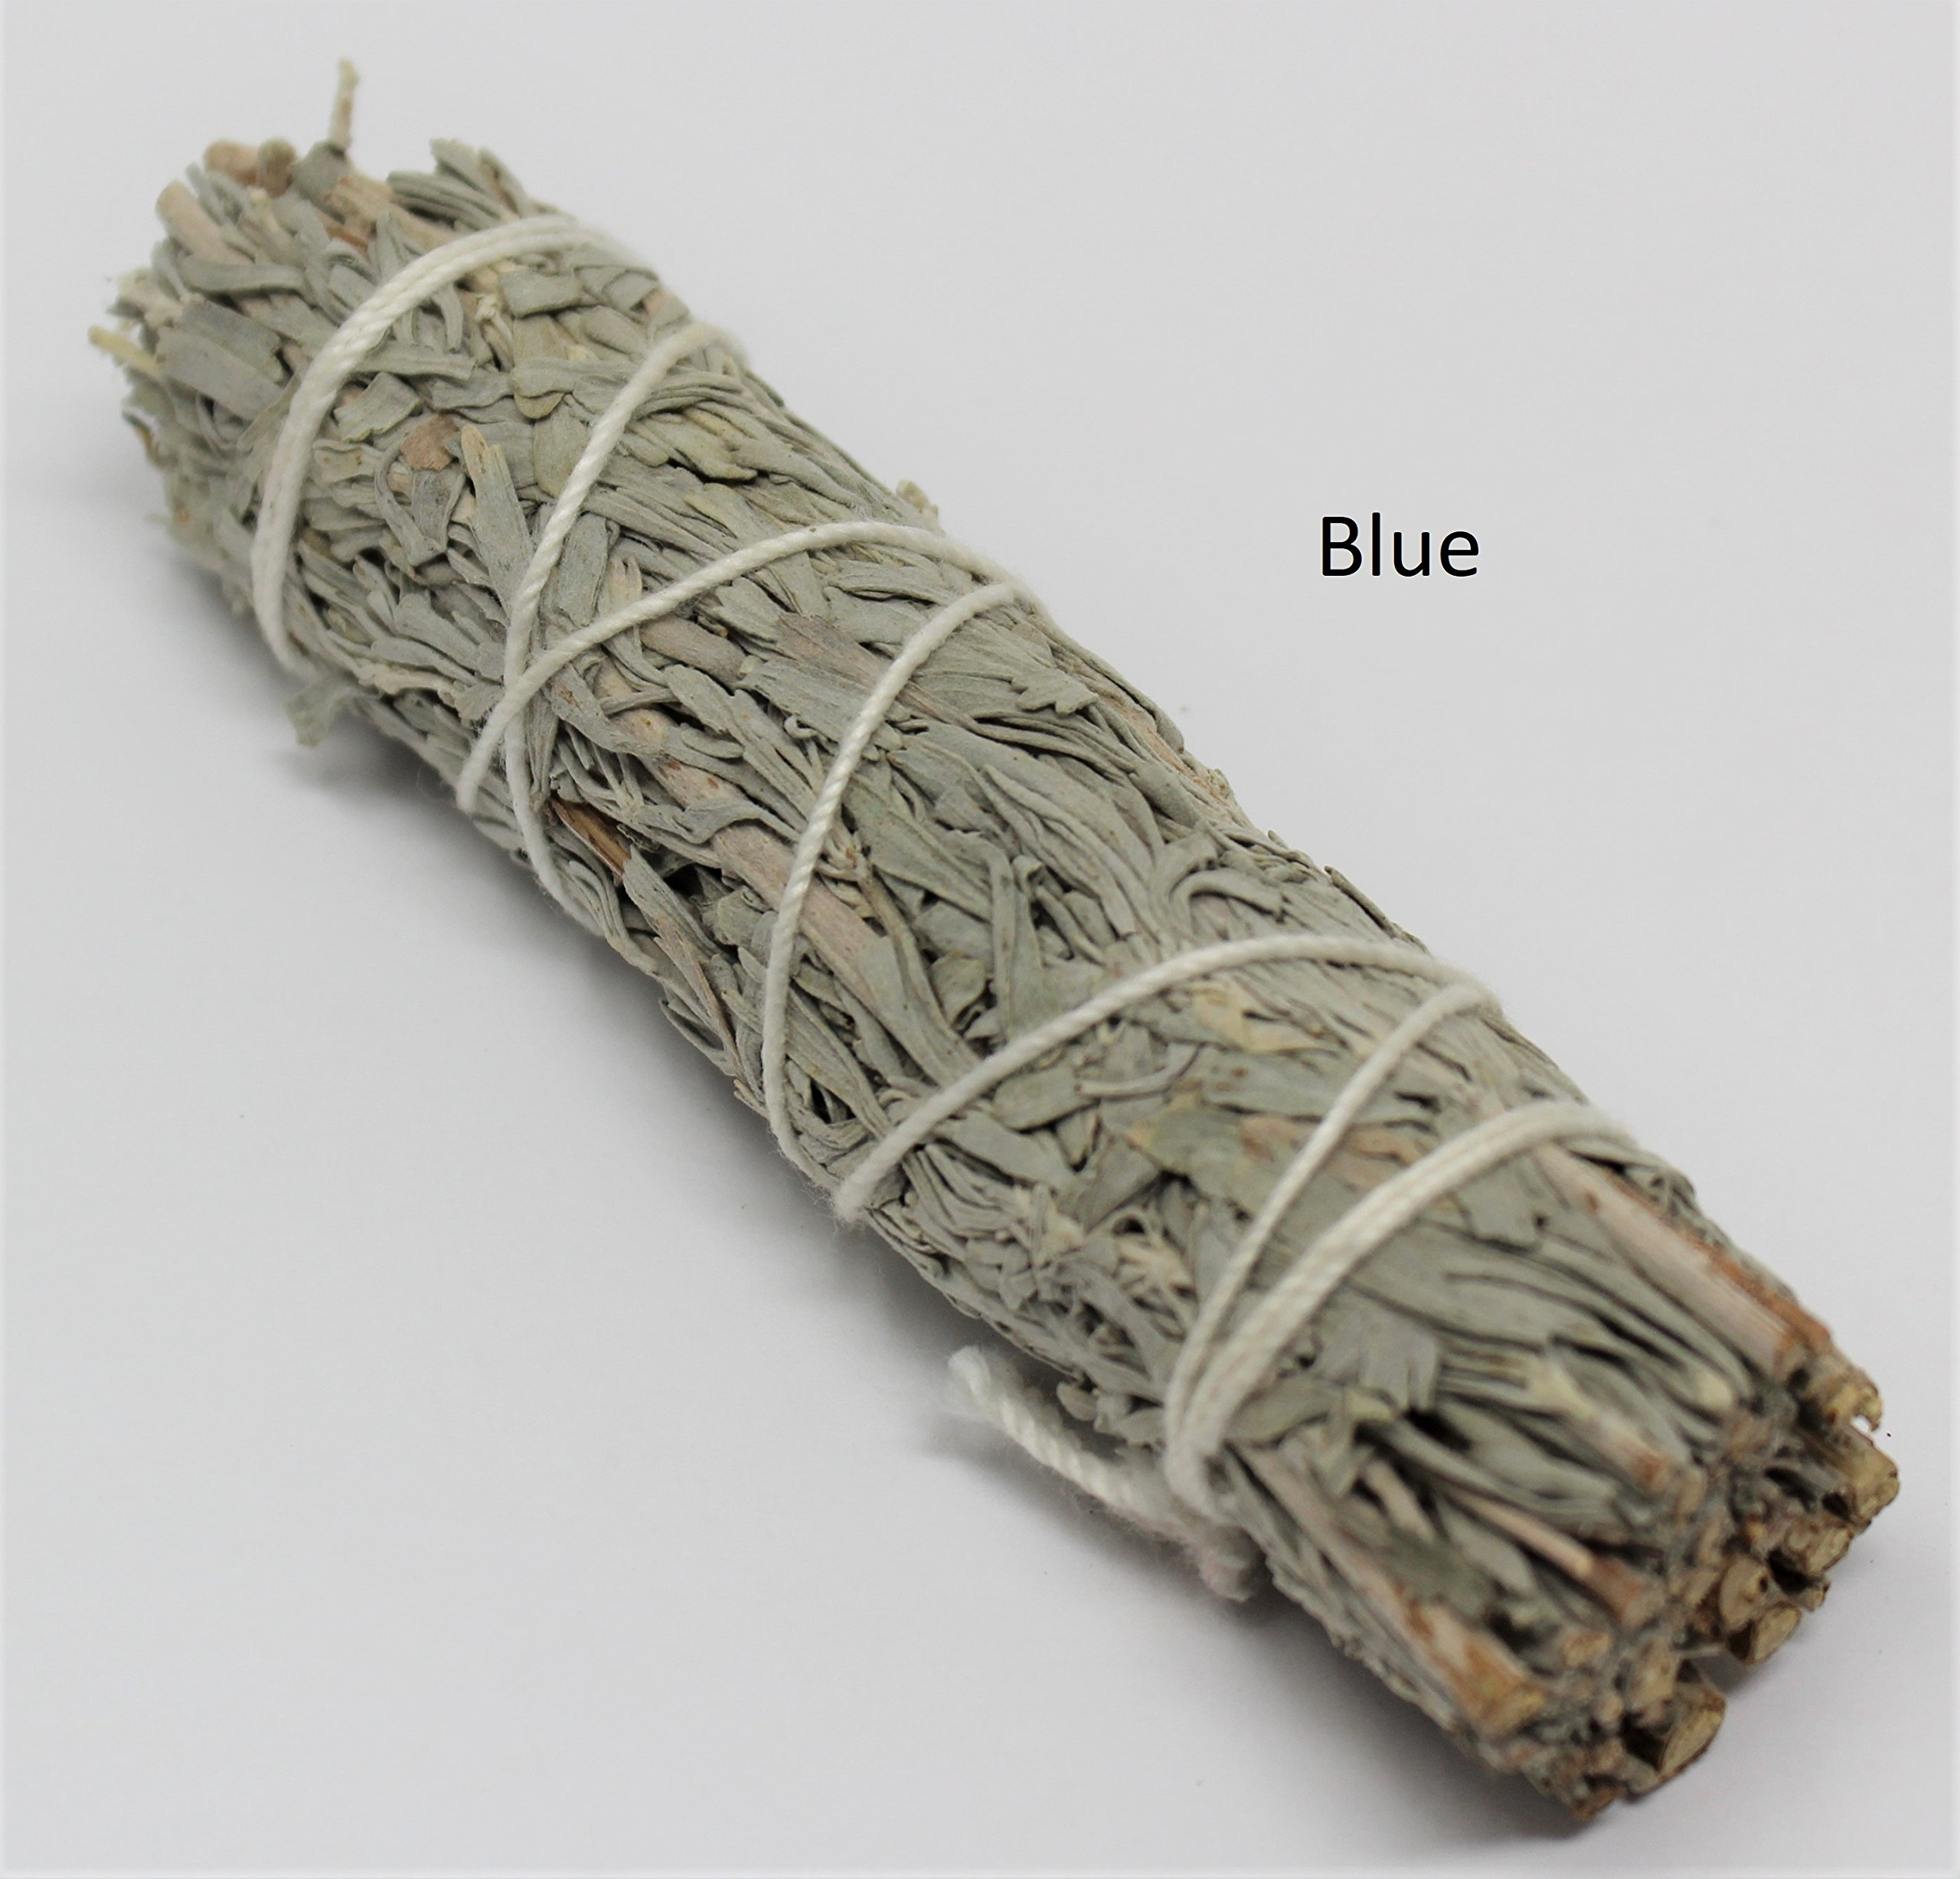 Rainbowrecords239 Set of 7 Sage Smudge Stick SAMPLER: White Black Blue Cedar Dragons Blood Desert Yerba Santa by Rainbowrecords239 (Image #4)